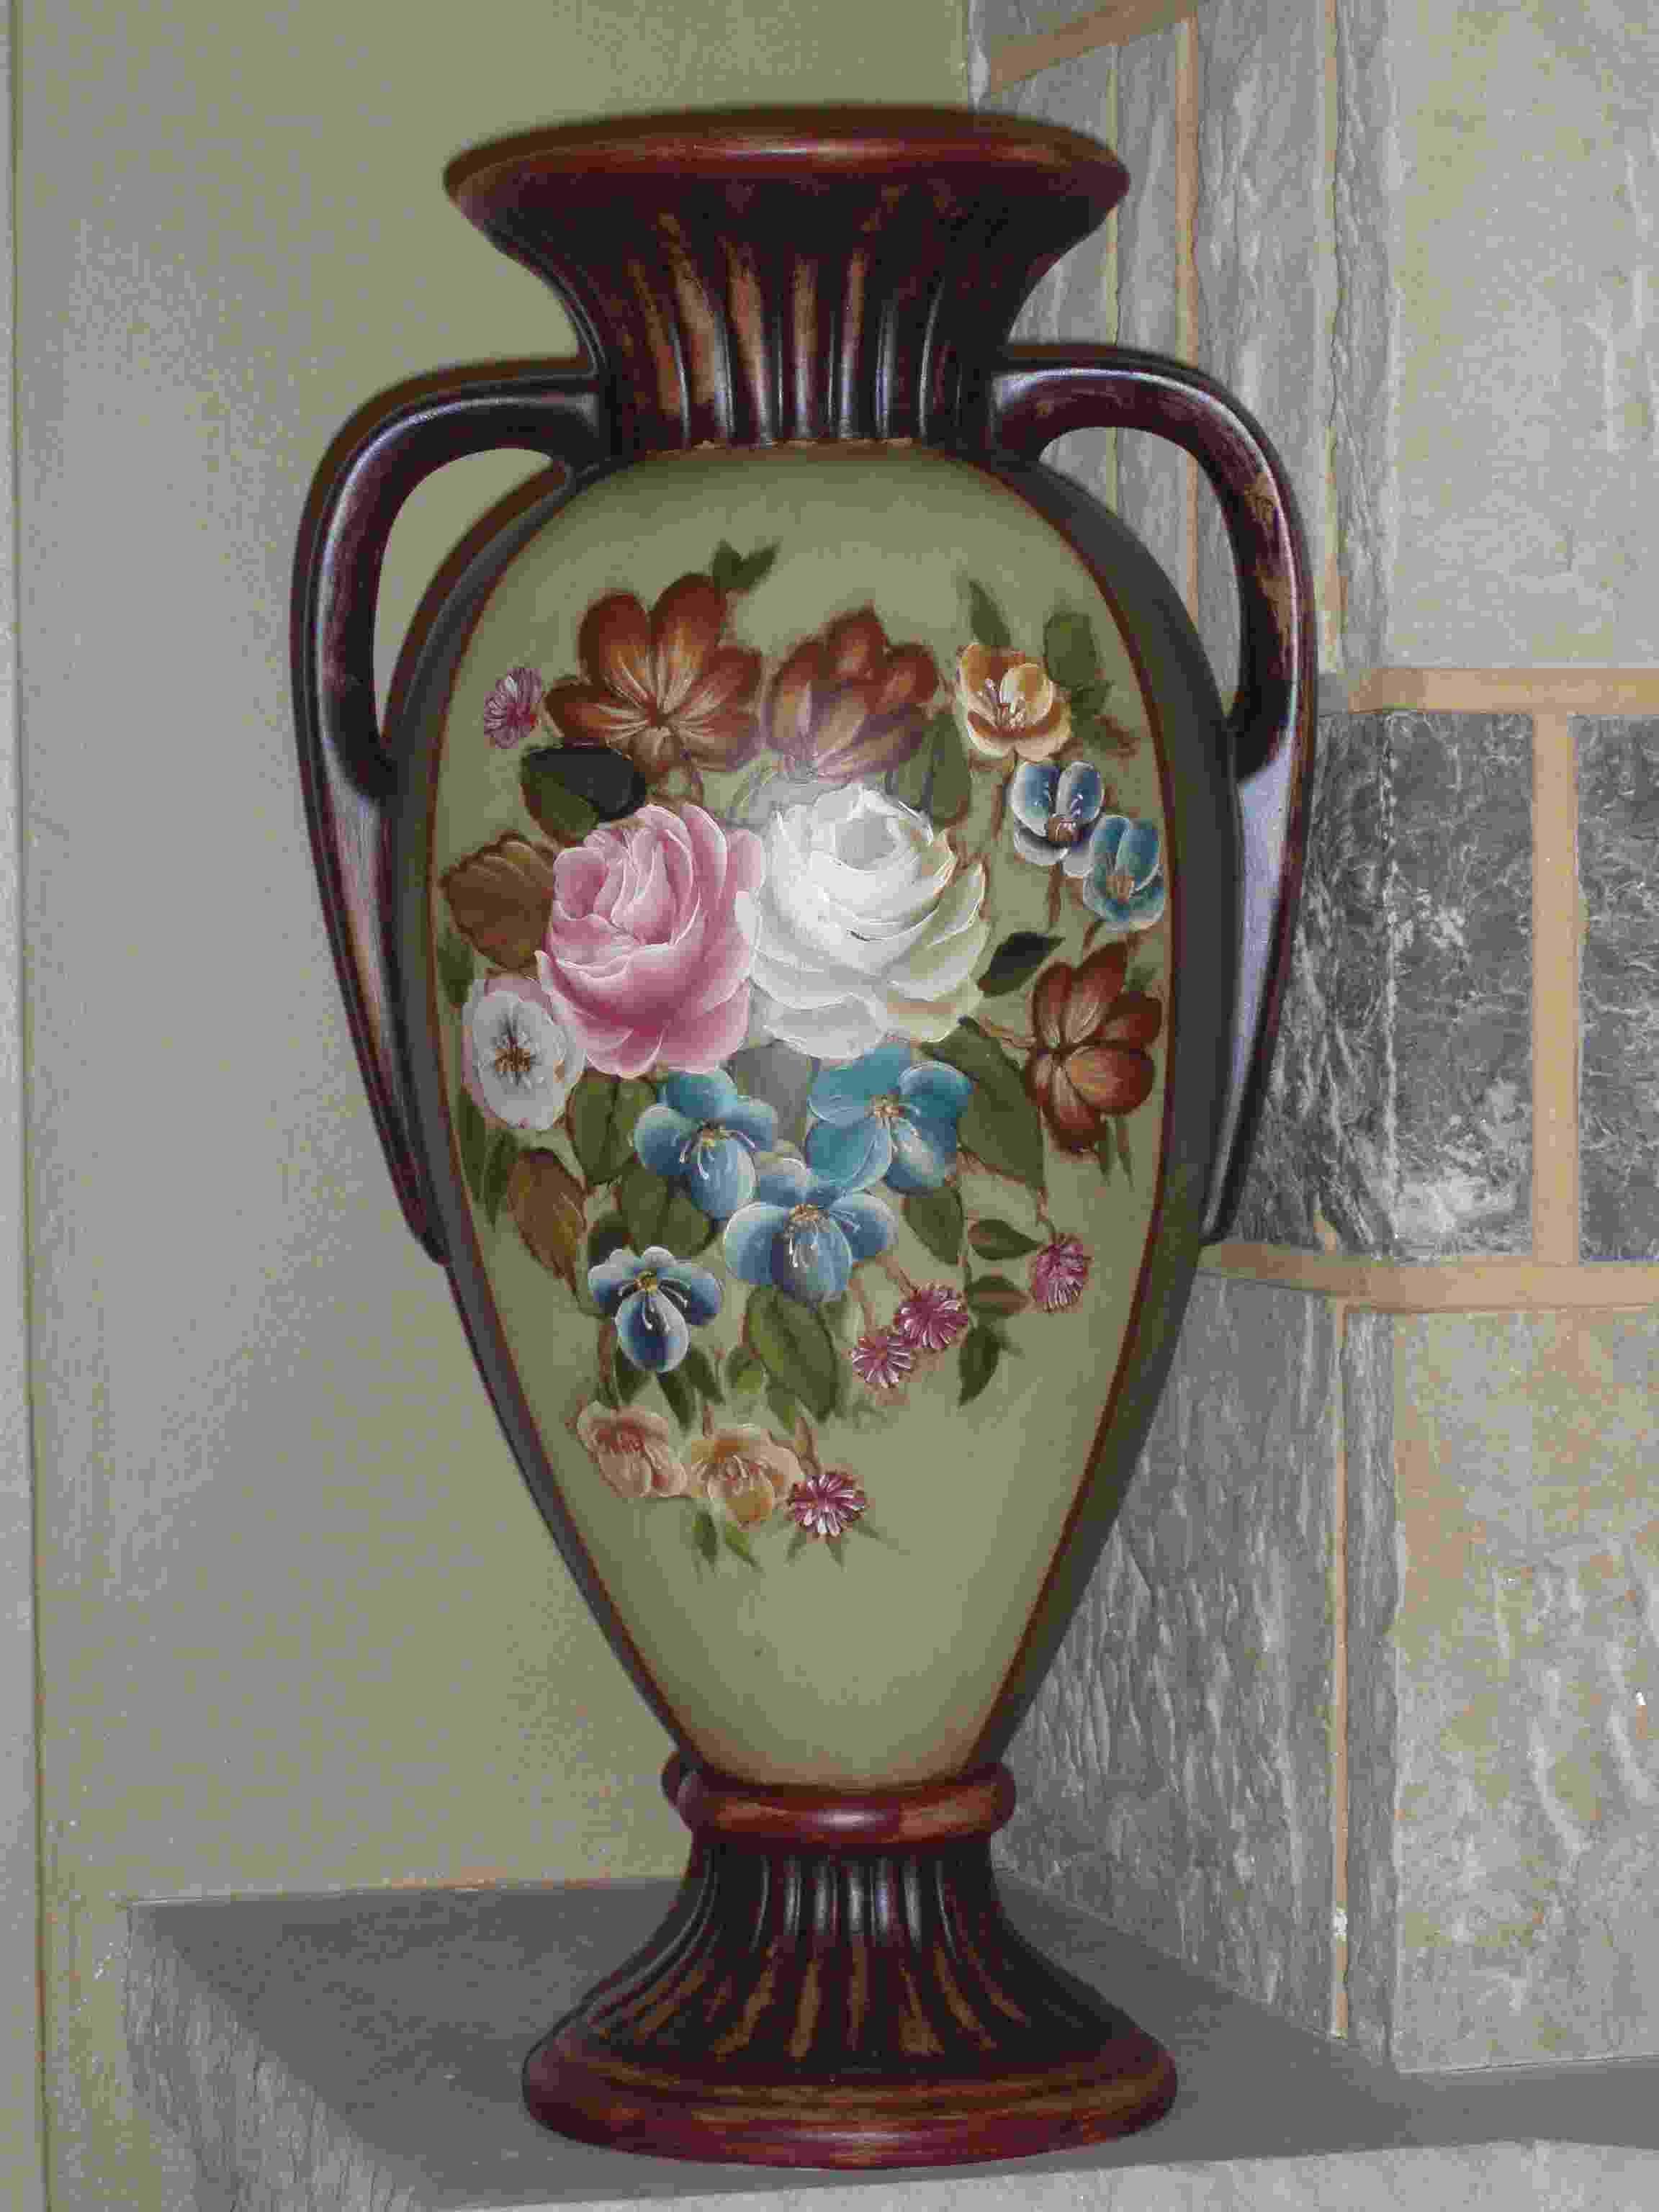 Seramik Vazo Boyama Googleda Ara Boyama Vase Ve Home Decor